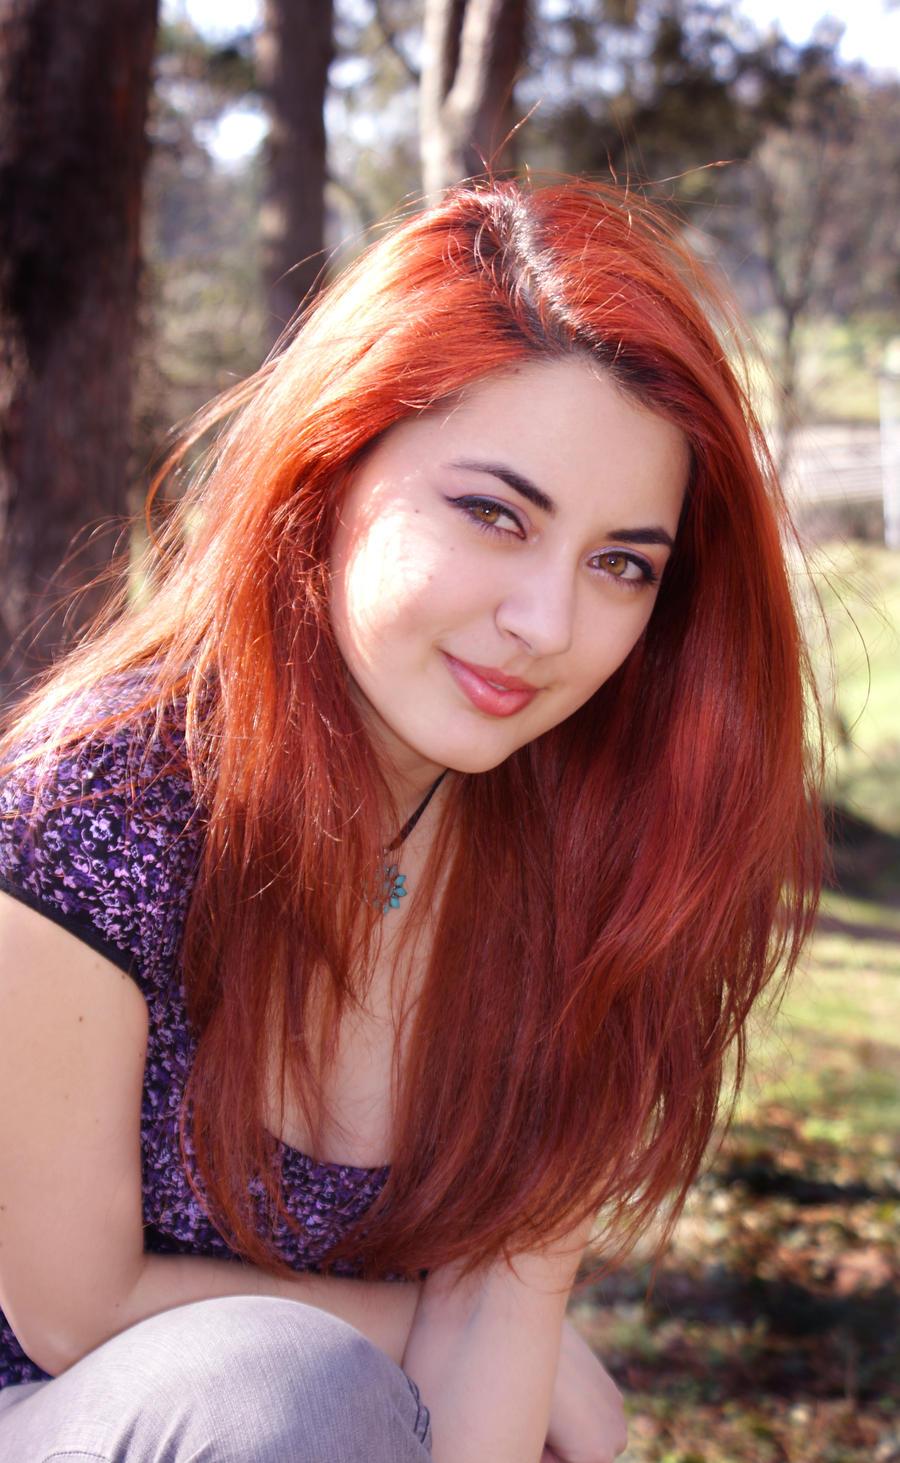 boobs-reserved-at-cute-redhead-teen-muslim